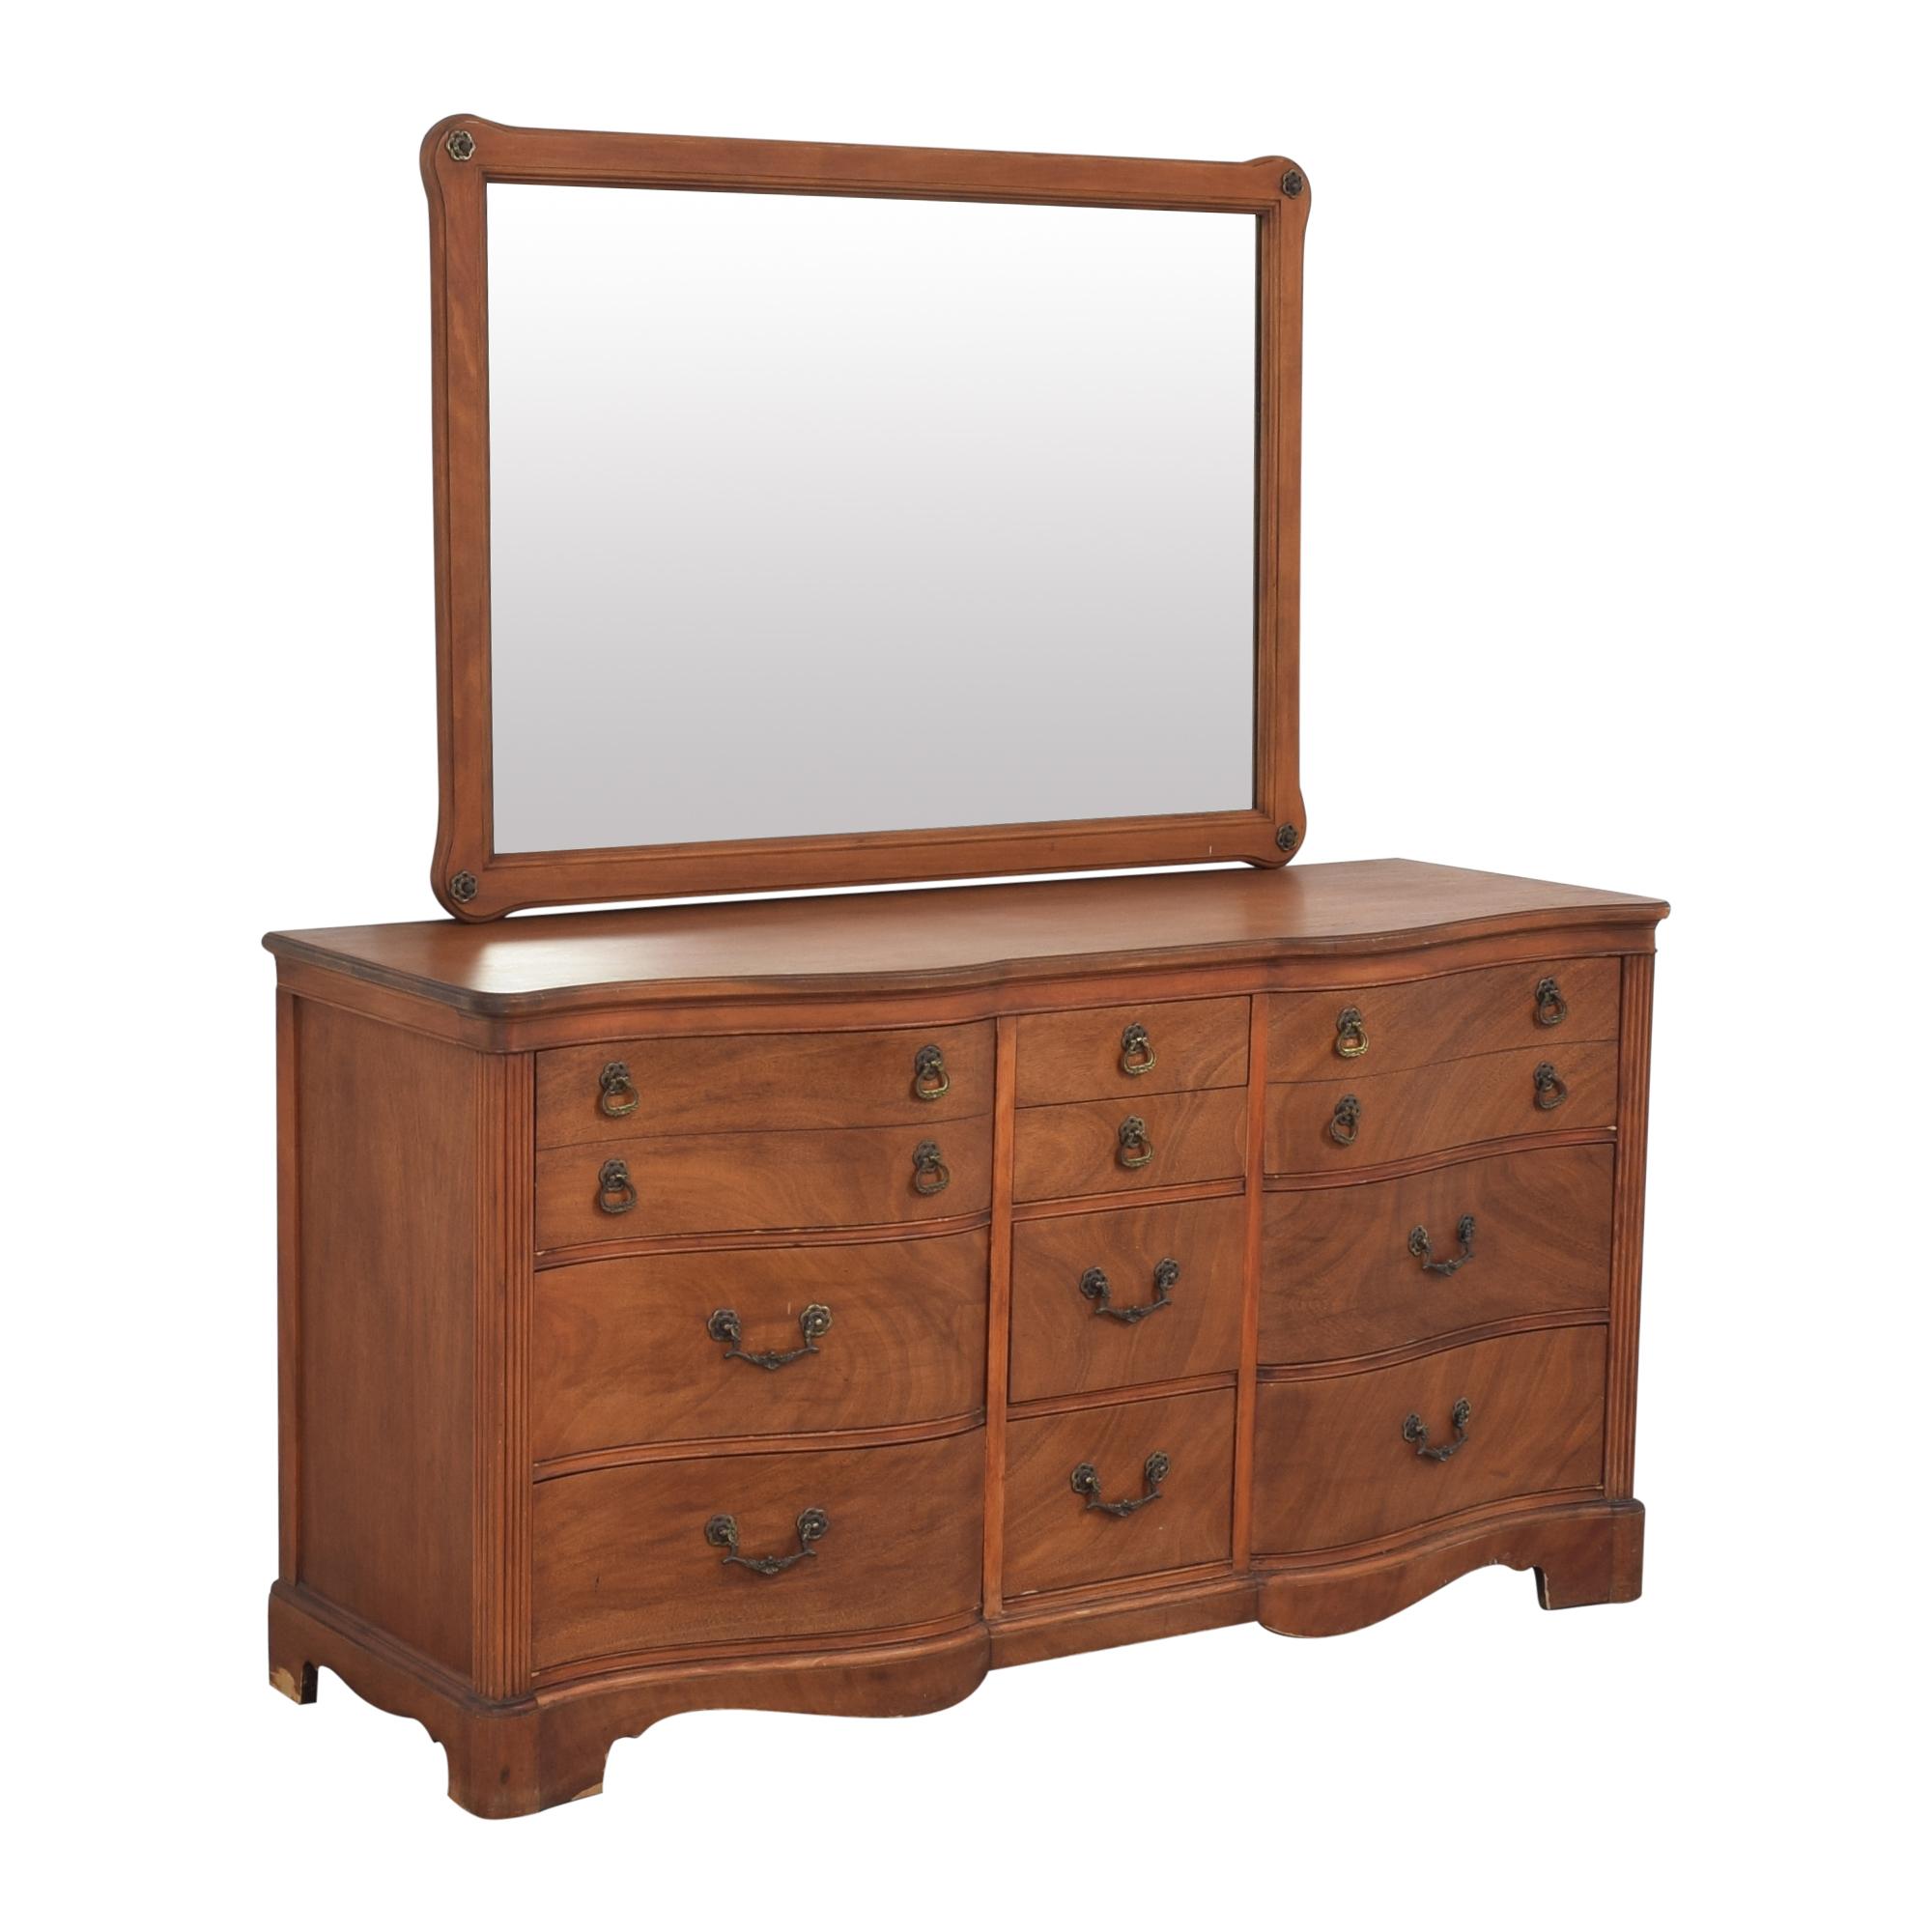 shop Drexel Drexel Triple Dresser with Mirror online